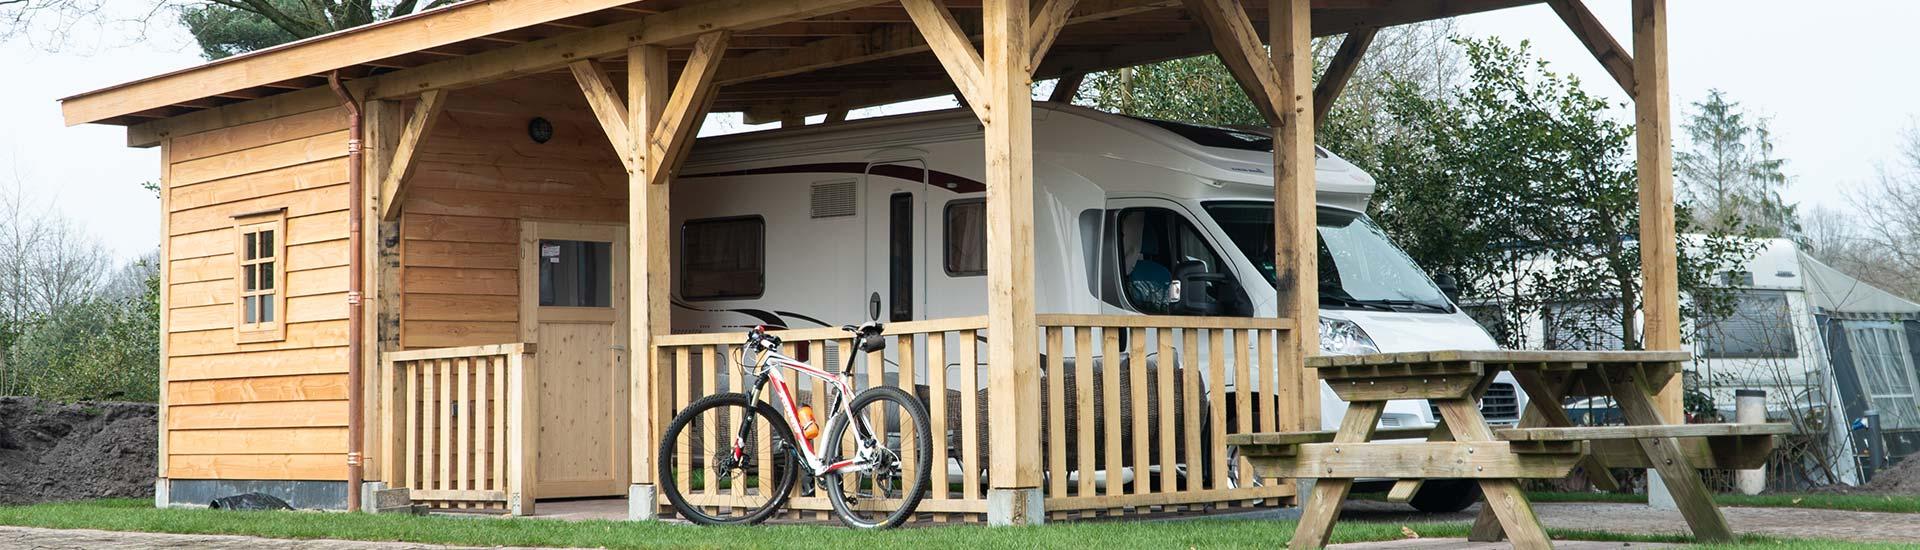 camperplaats-drenthe-camperpark-dwingeloo-met-overkapping-carport-02